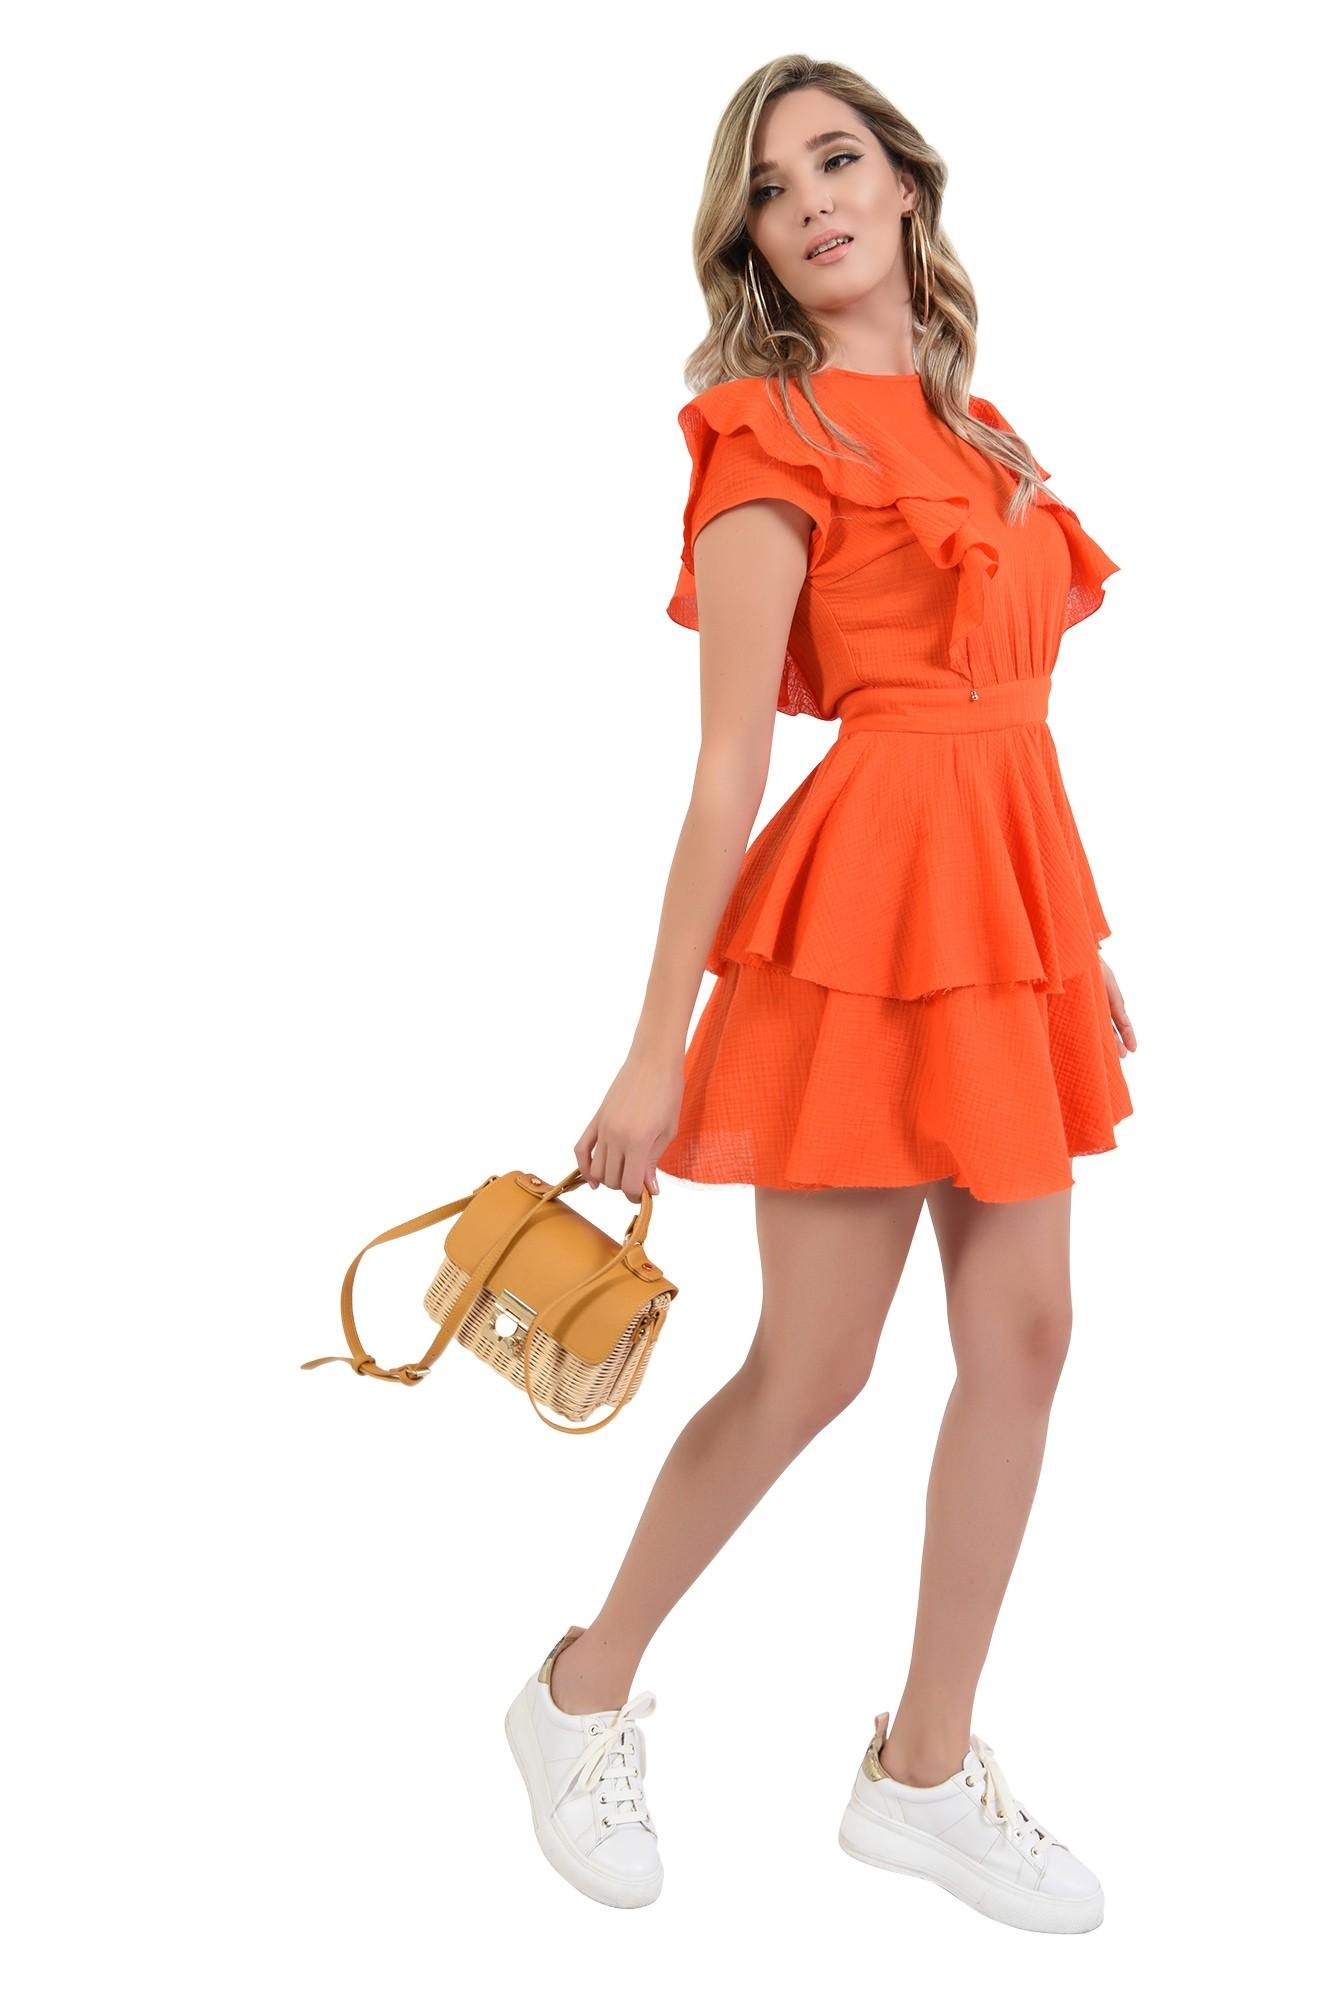 3 - 360 - rochie mini, orange, cu volane, Poema